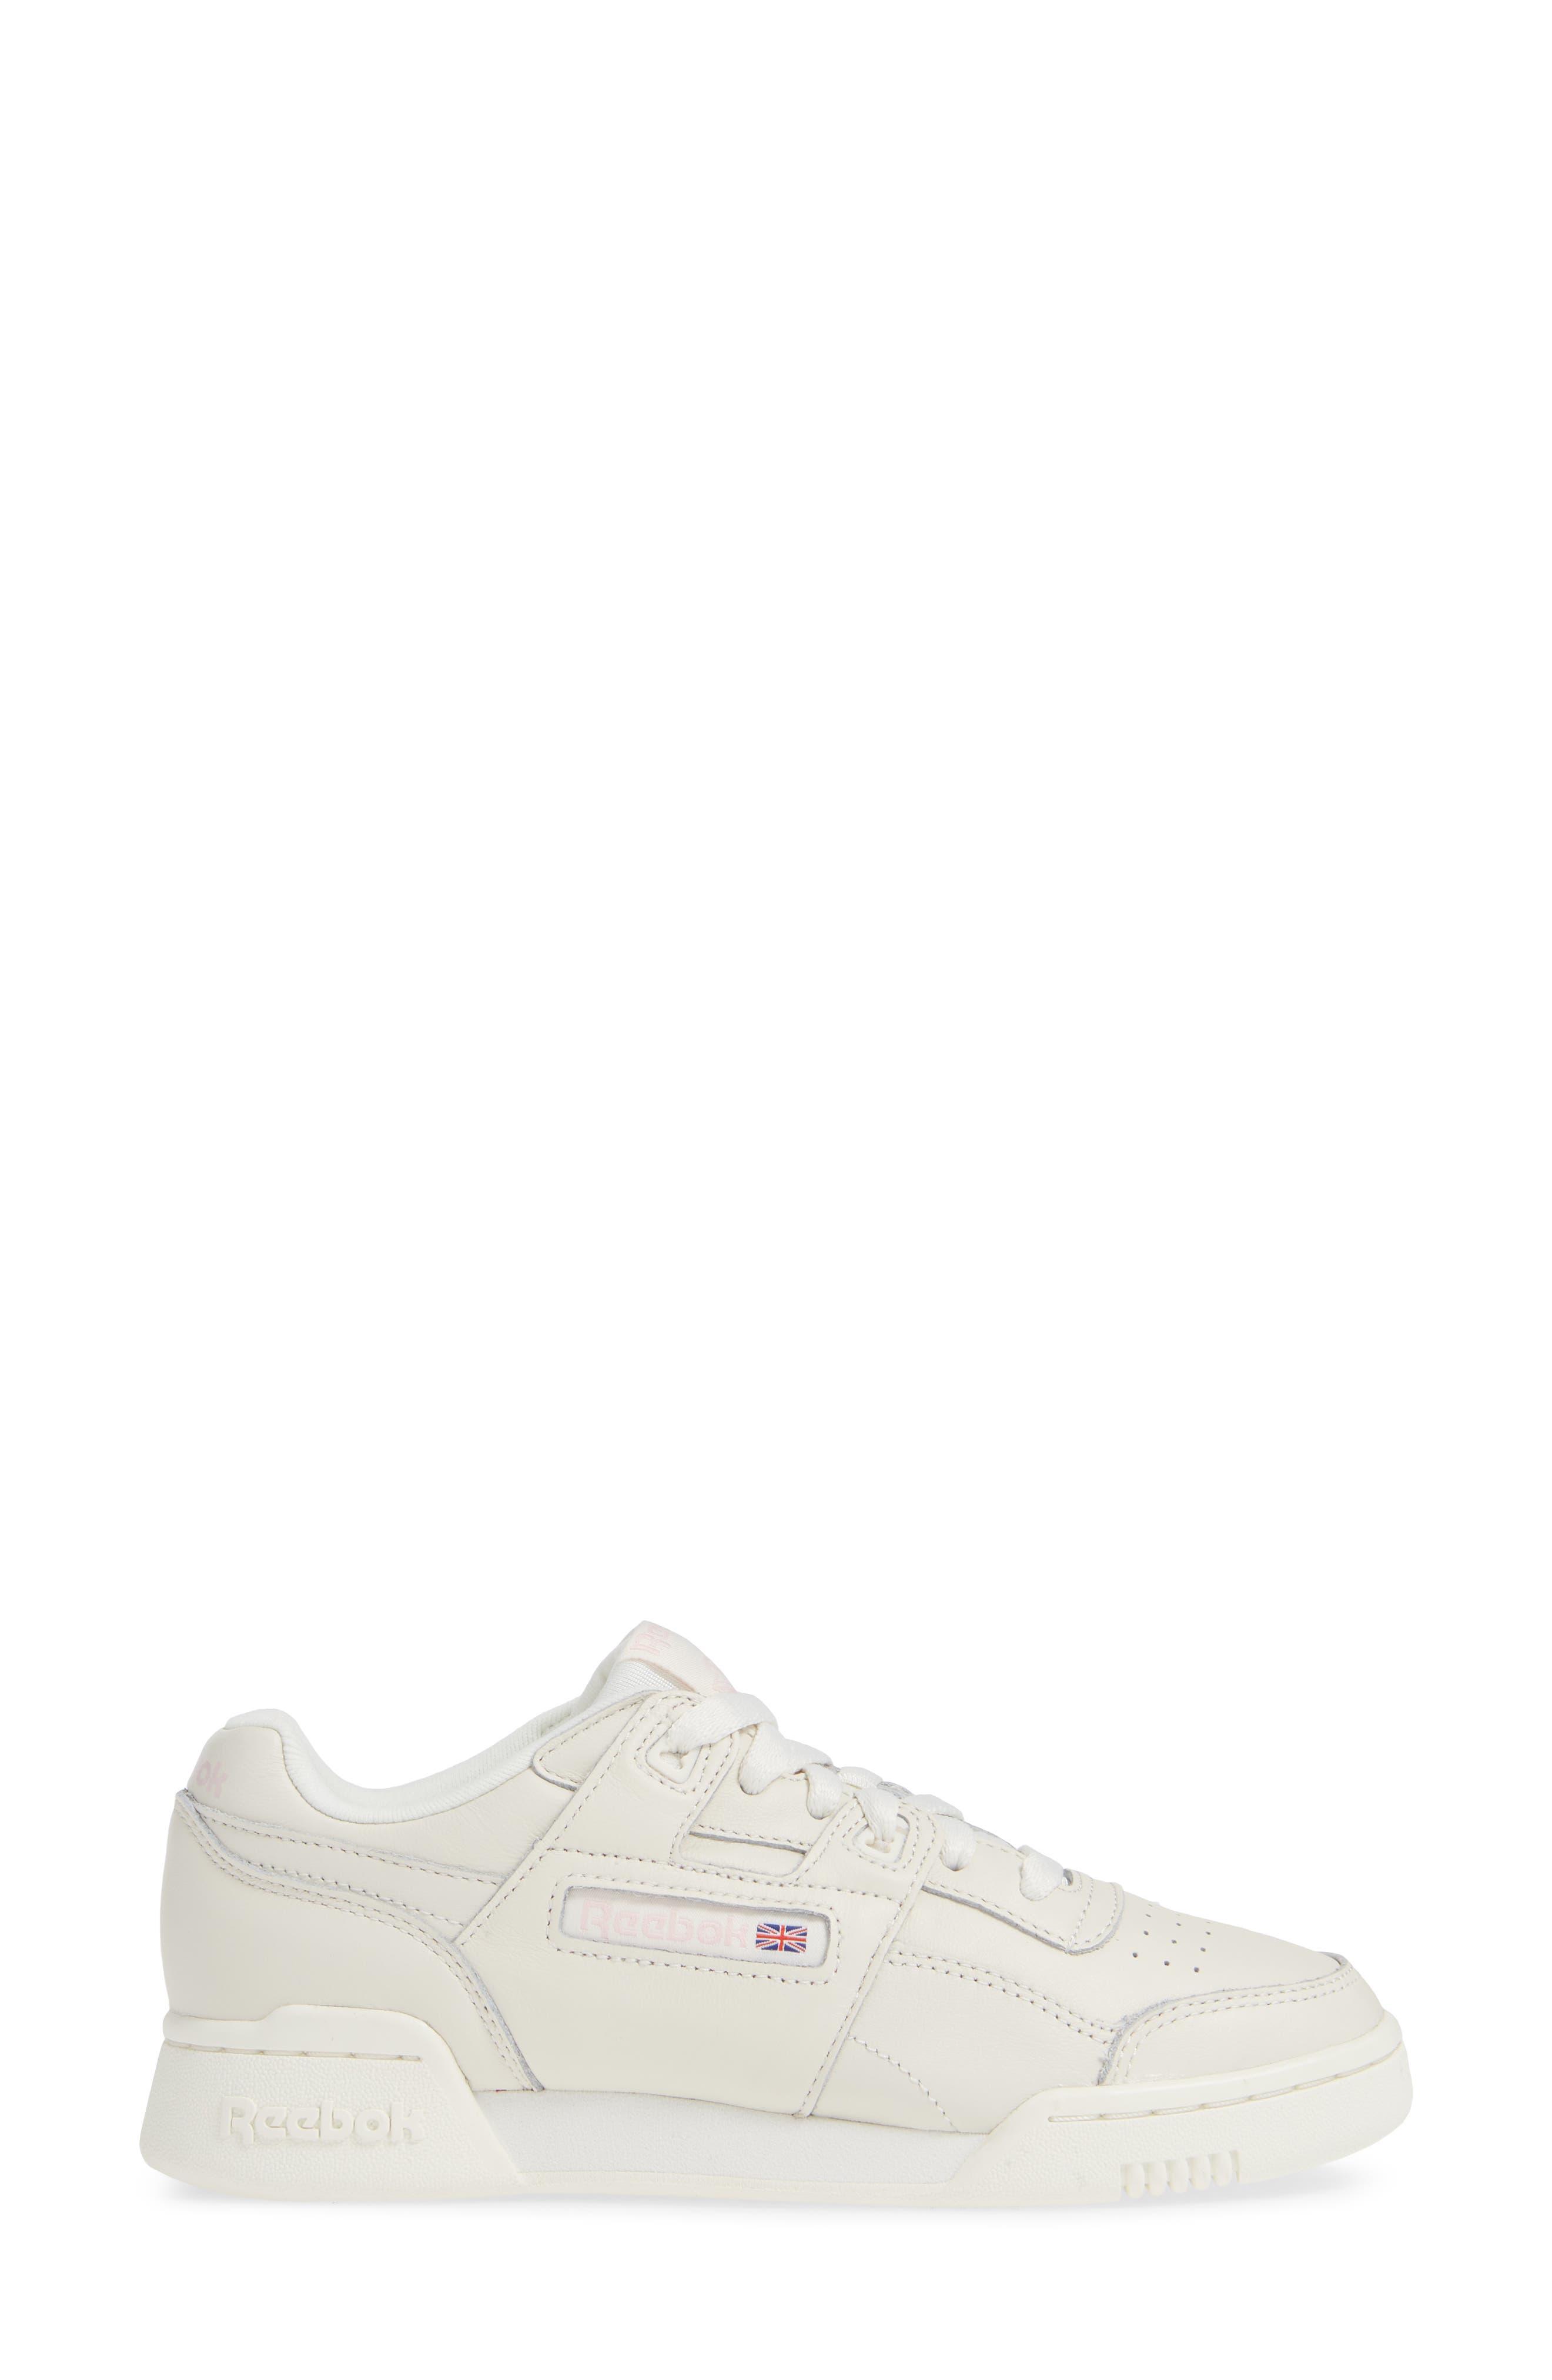 Workout Low Plus Sneaker,                             Alternate thumbnail 3, color,                             WHITE/ PRACTICAL PINK